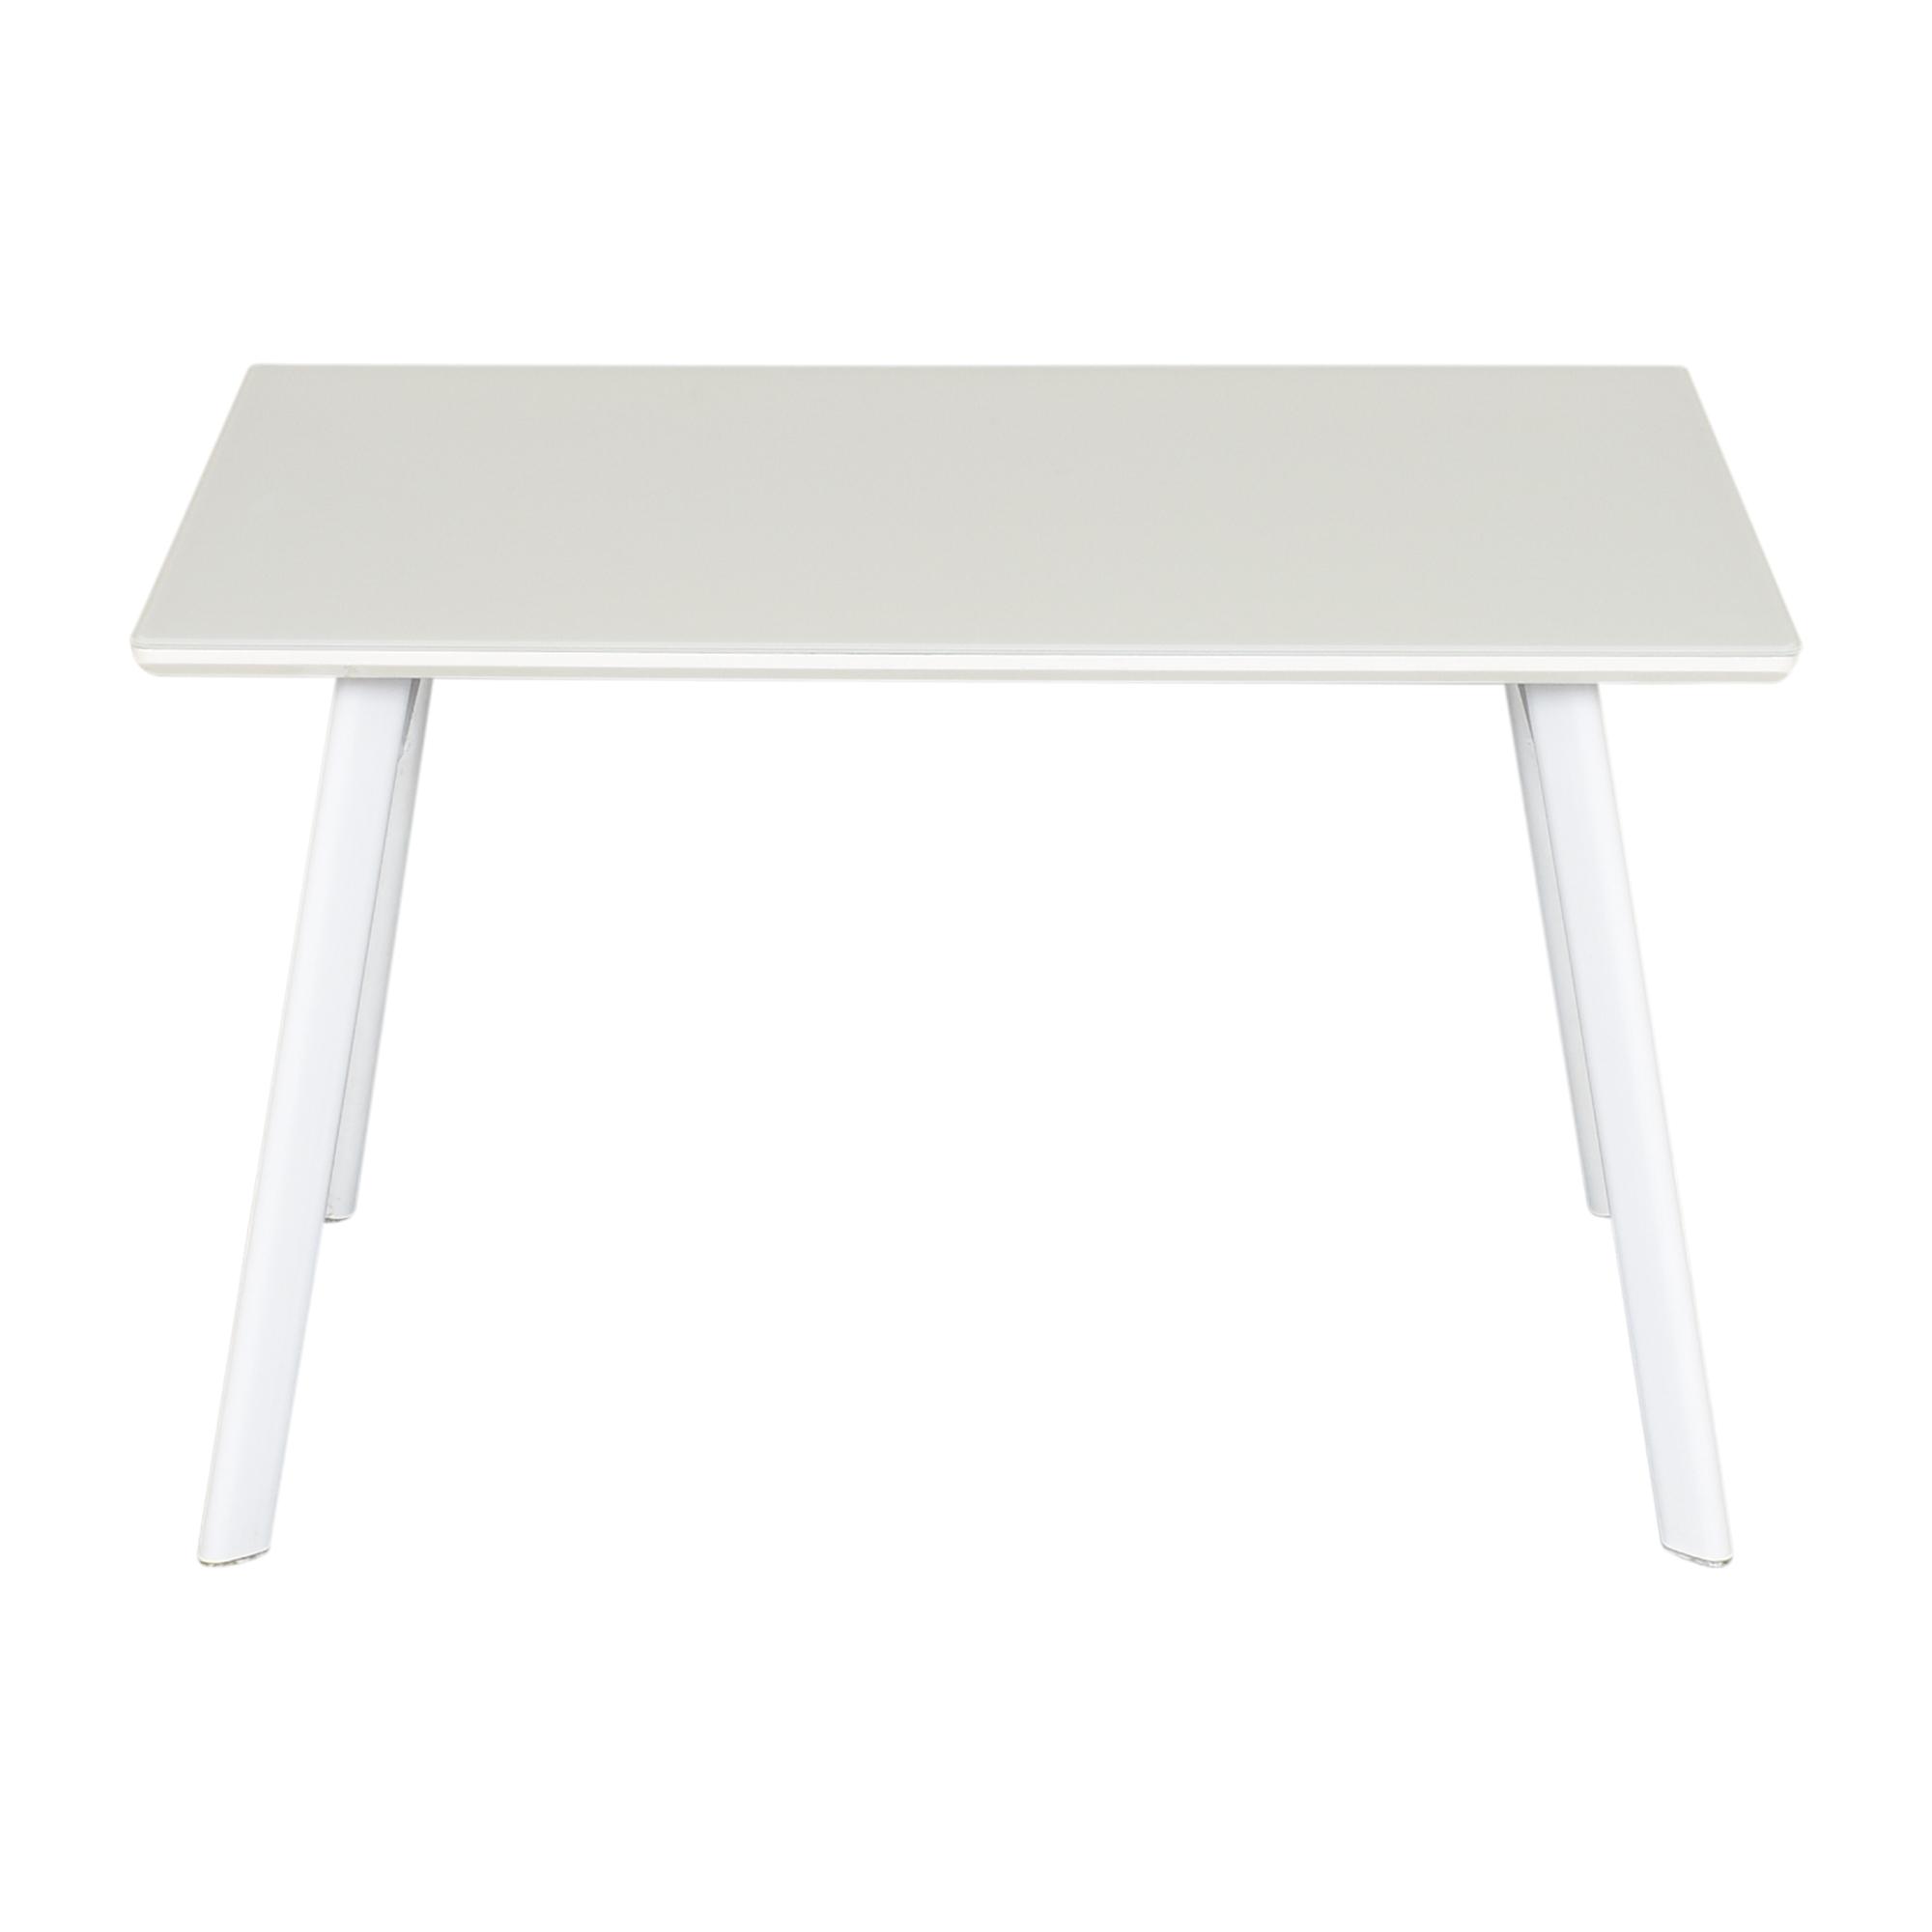 Zuo Modern Rectangular Dining Table / Dinner Tables